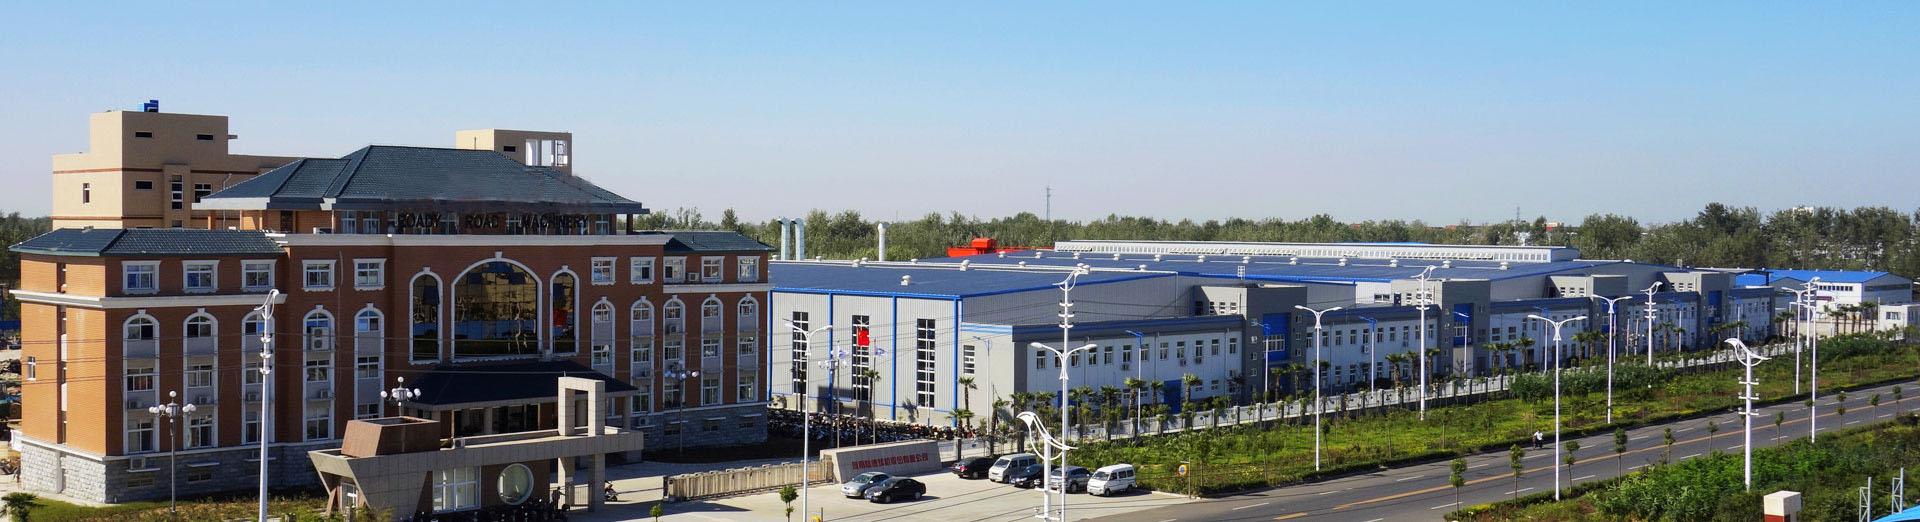 Roady factory